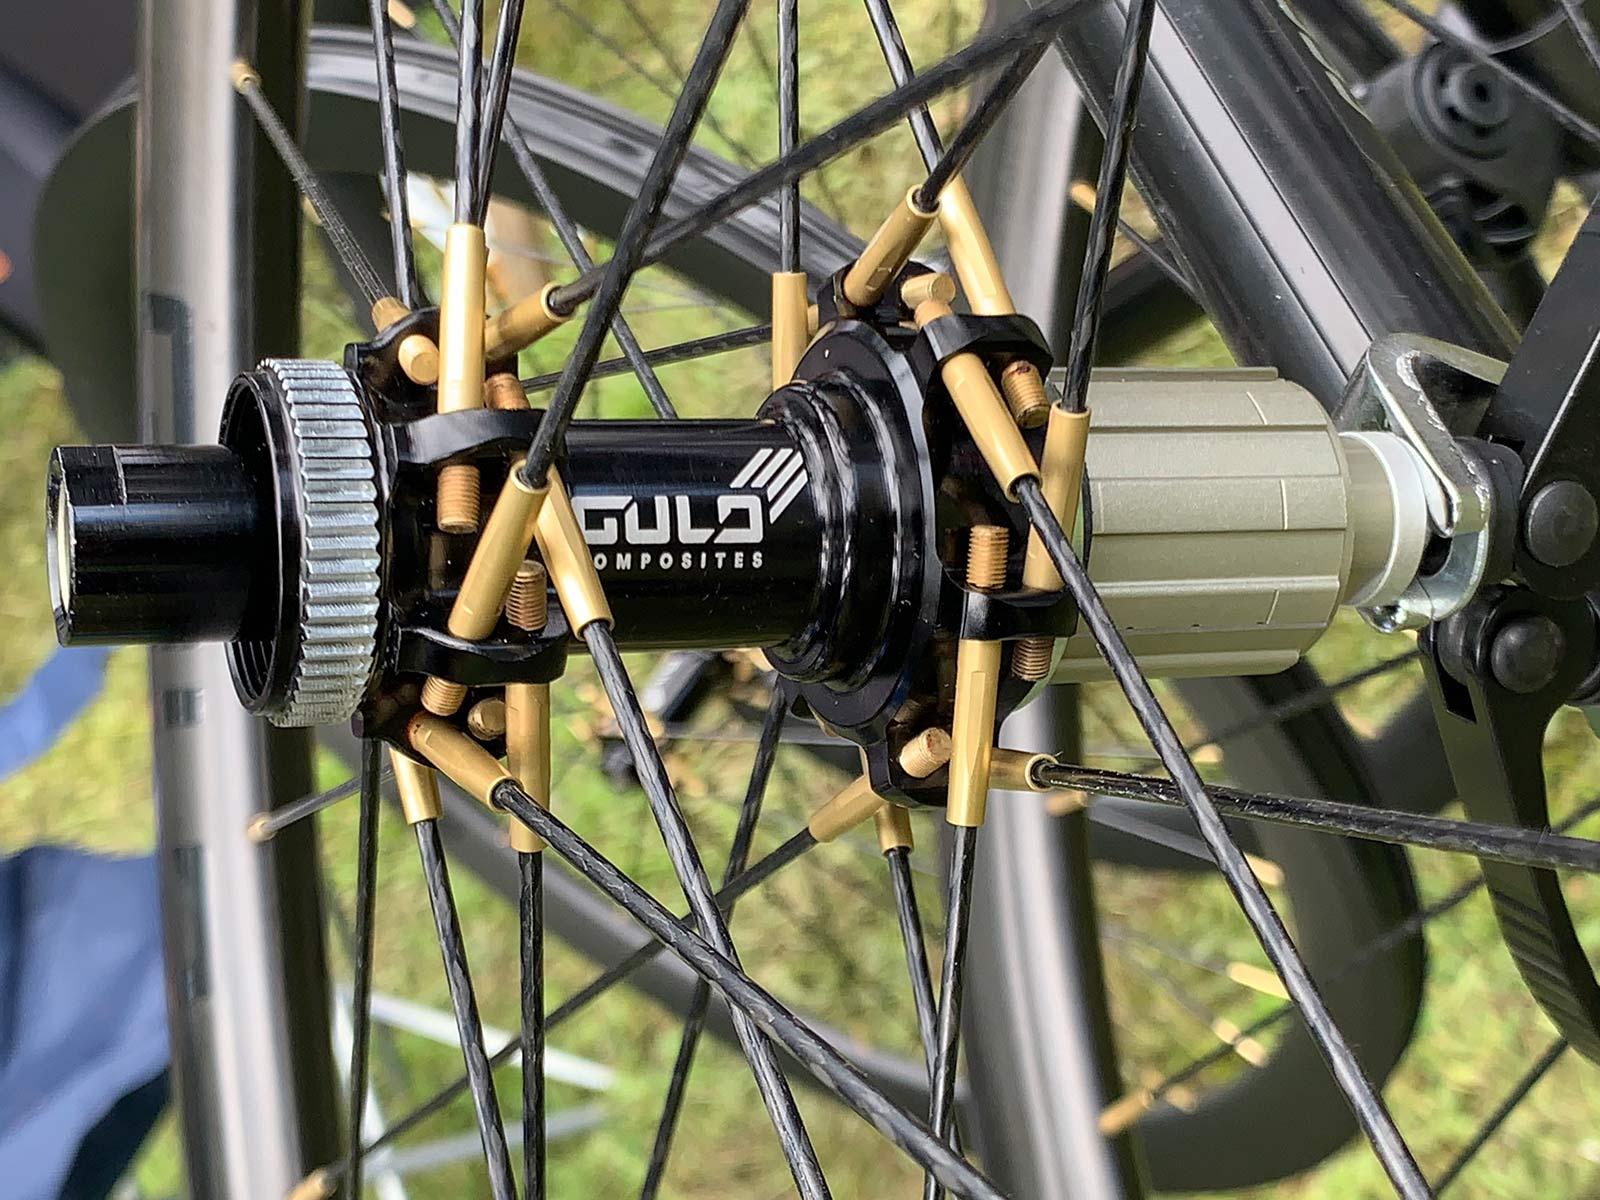 gulo composites hubs